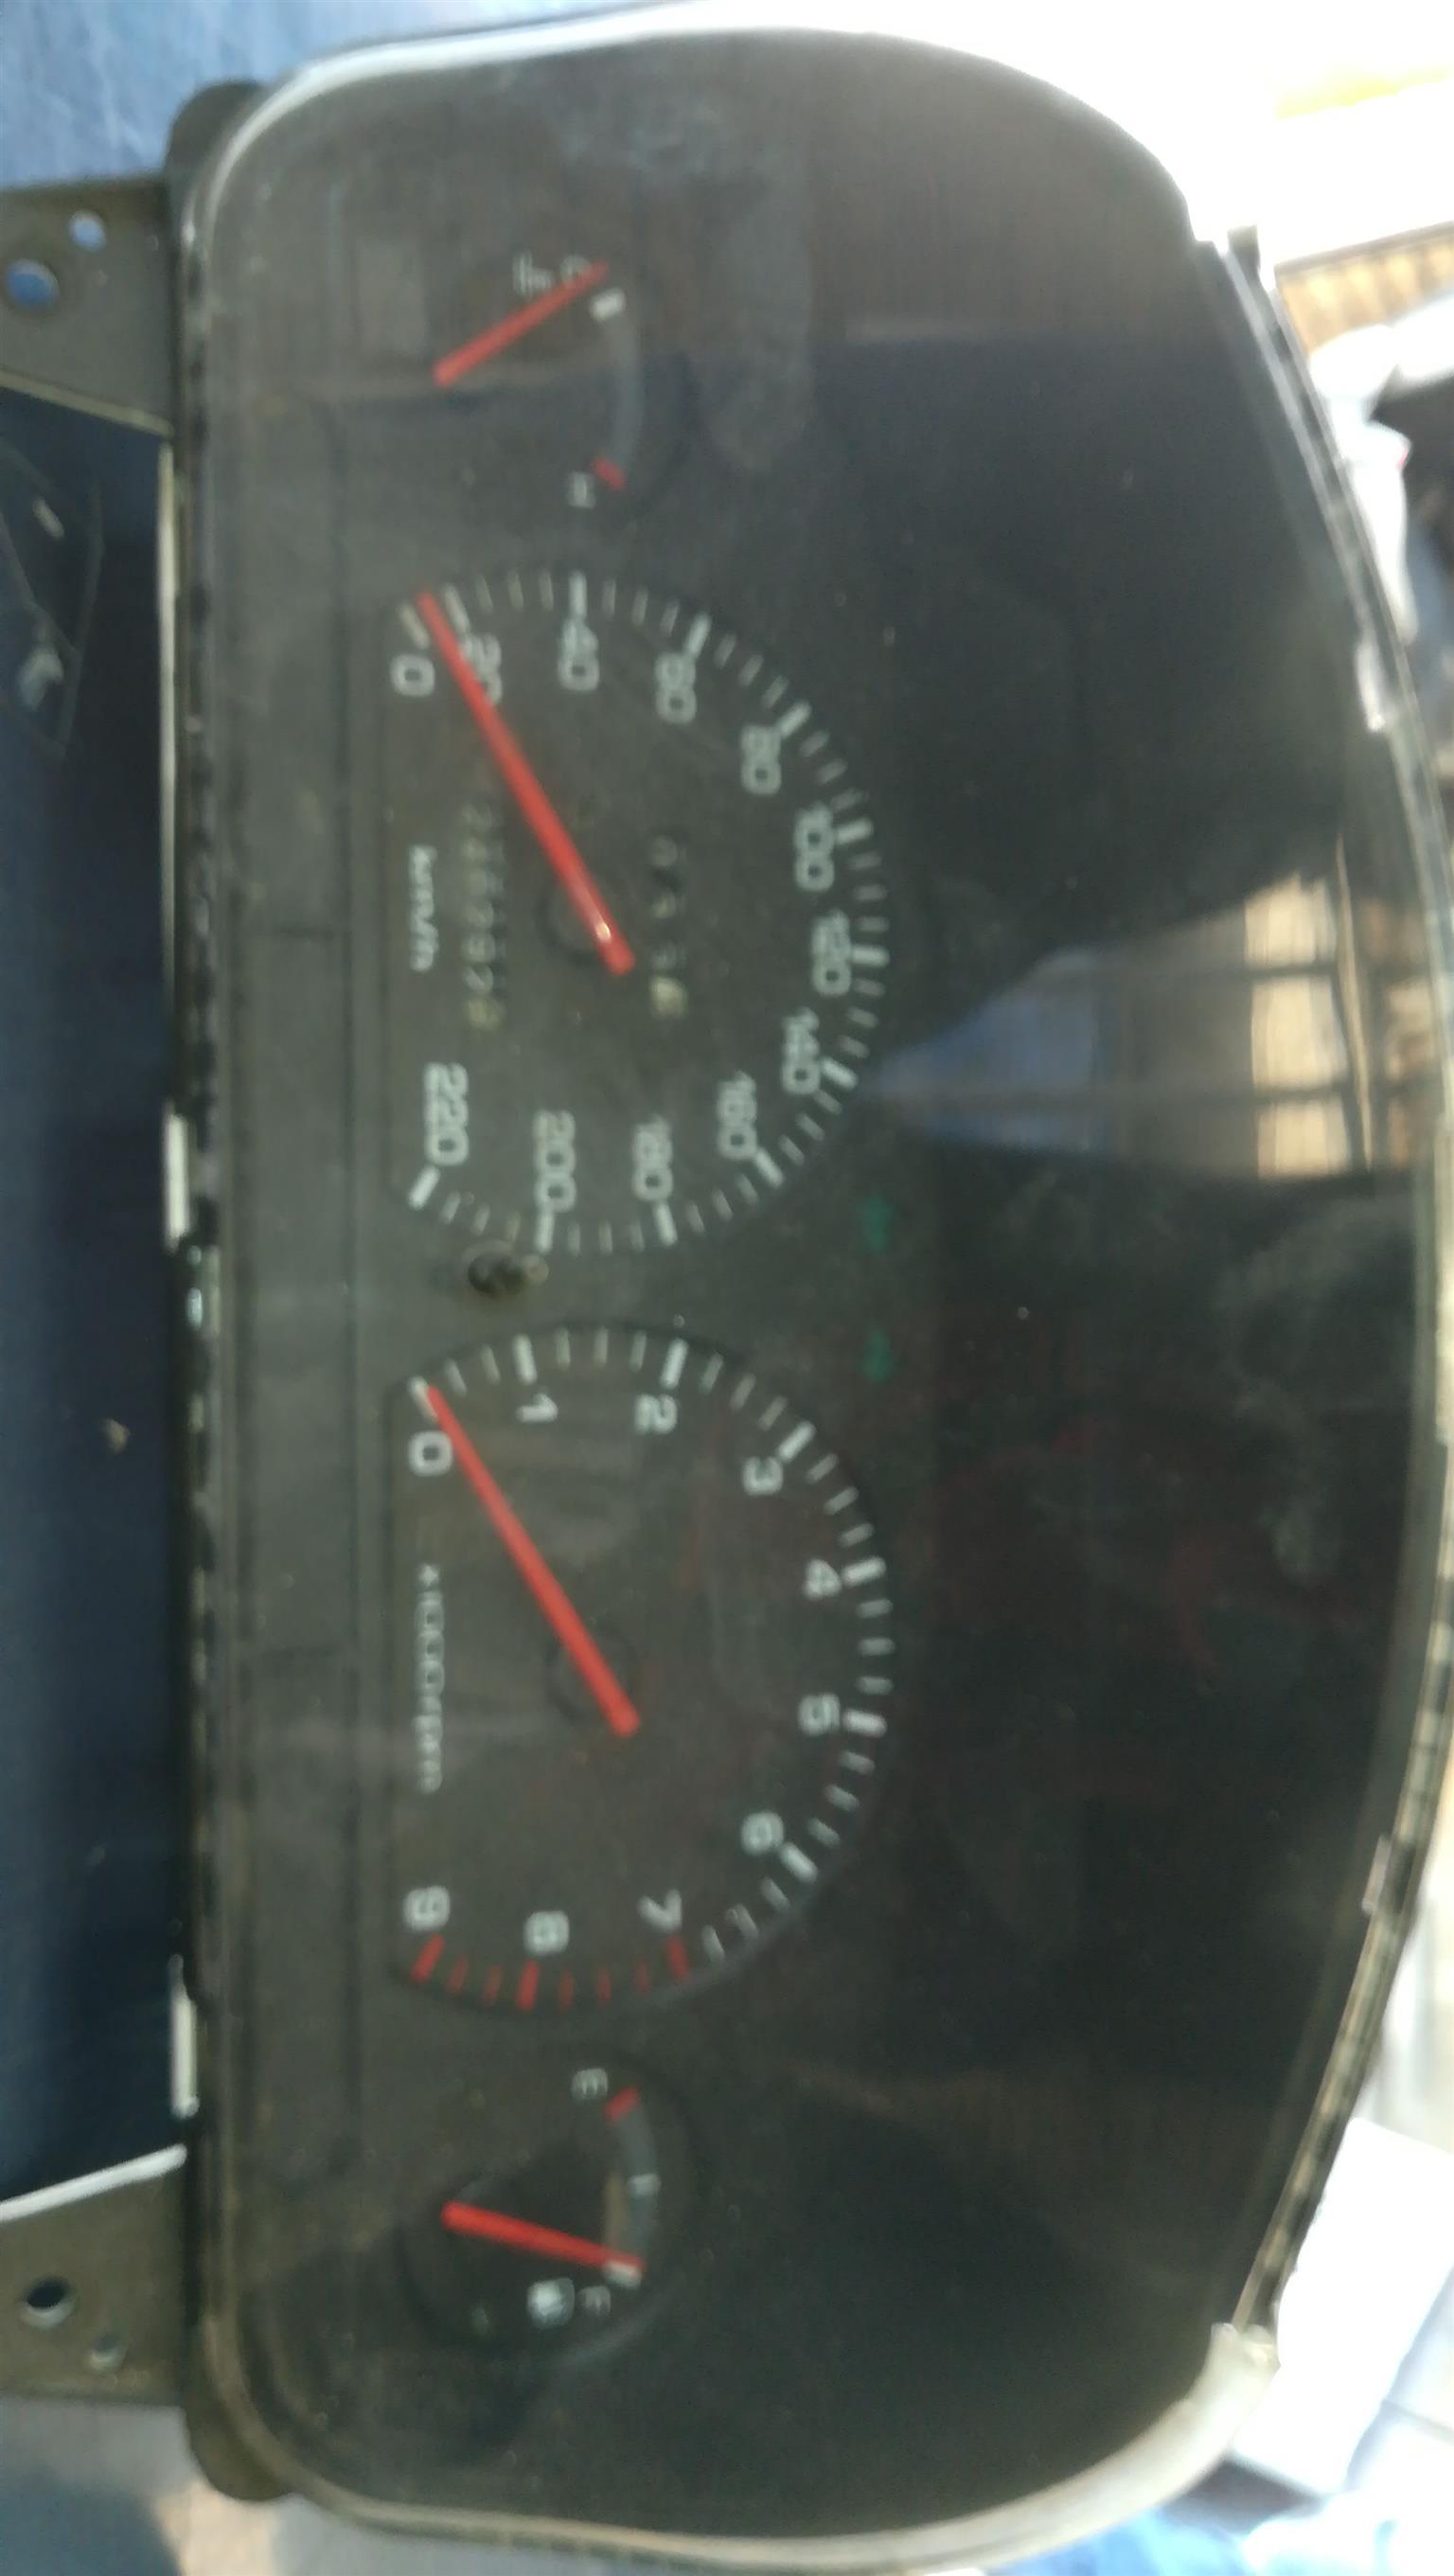 Hyundai Accent speedo cluster